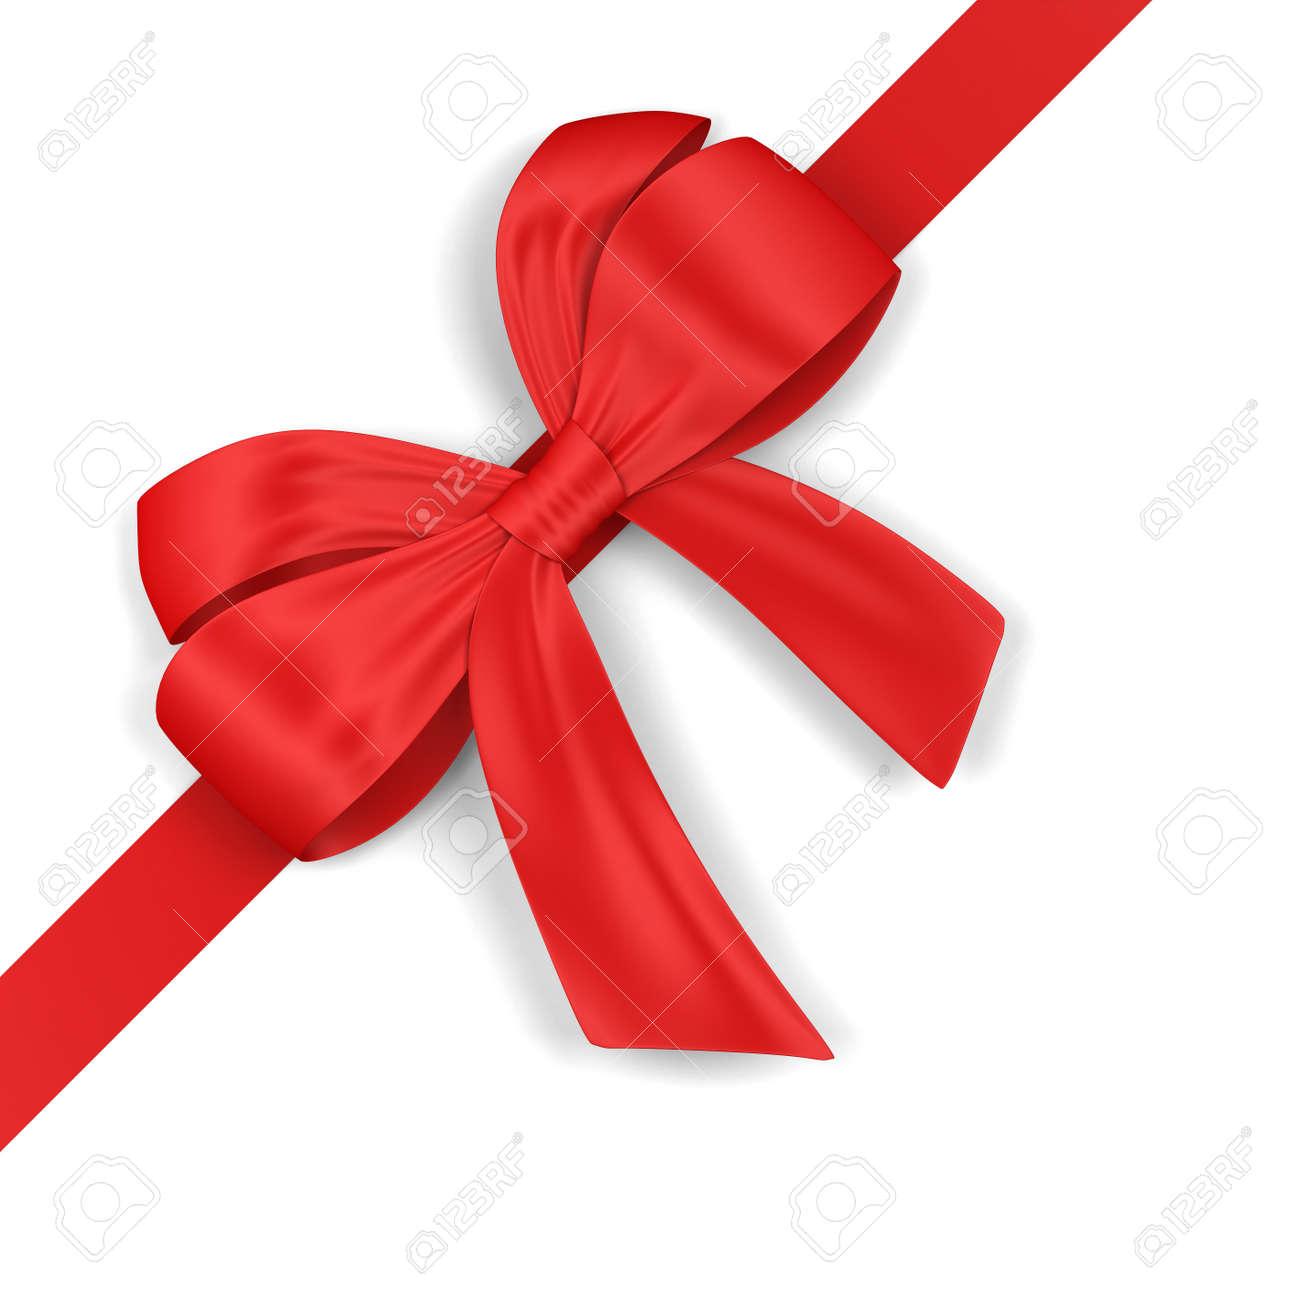 Elegant present bow. 3d illustration isolated on white background - 153701977